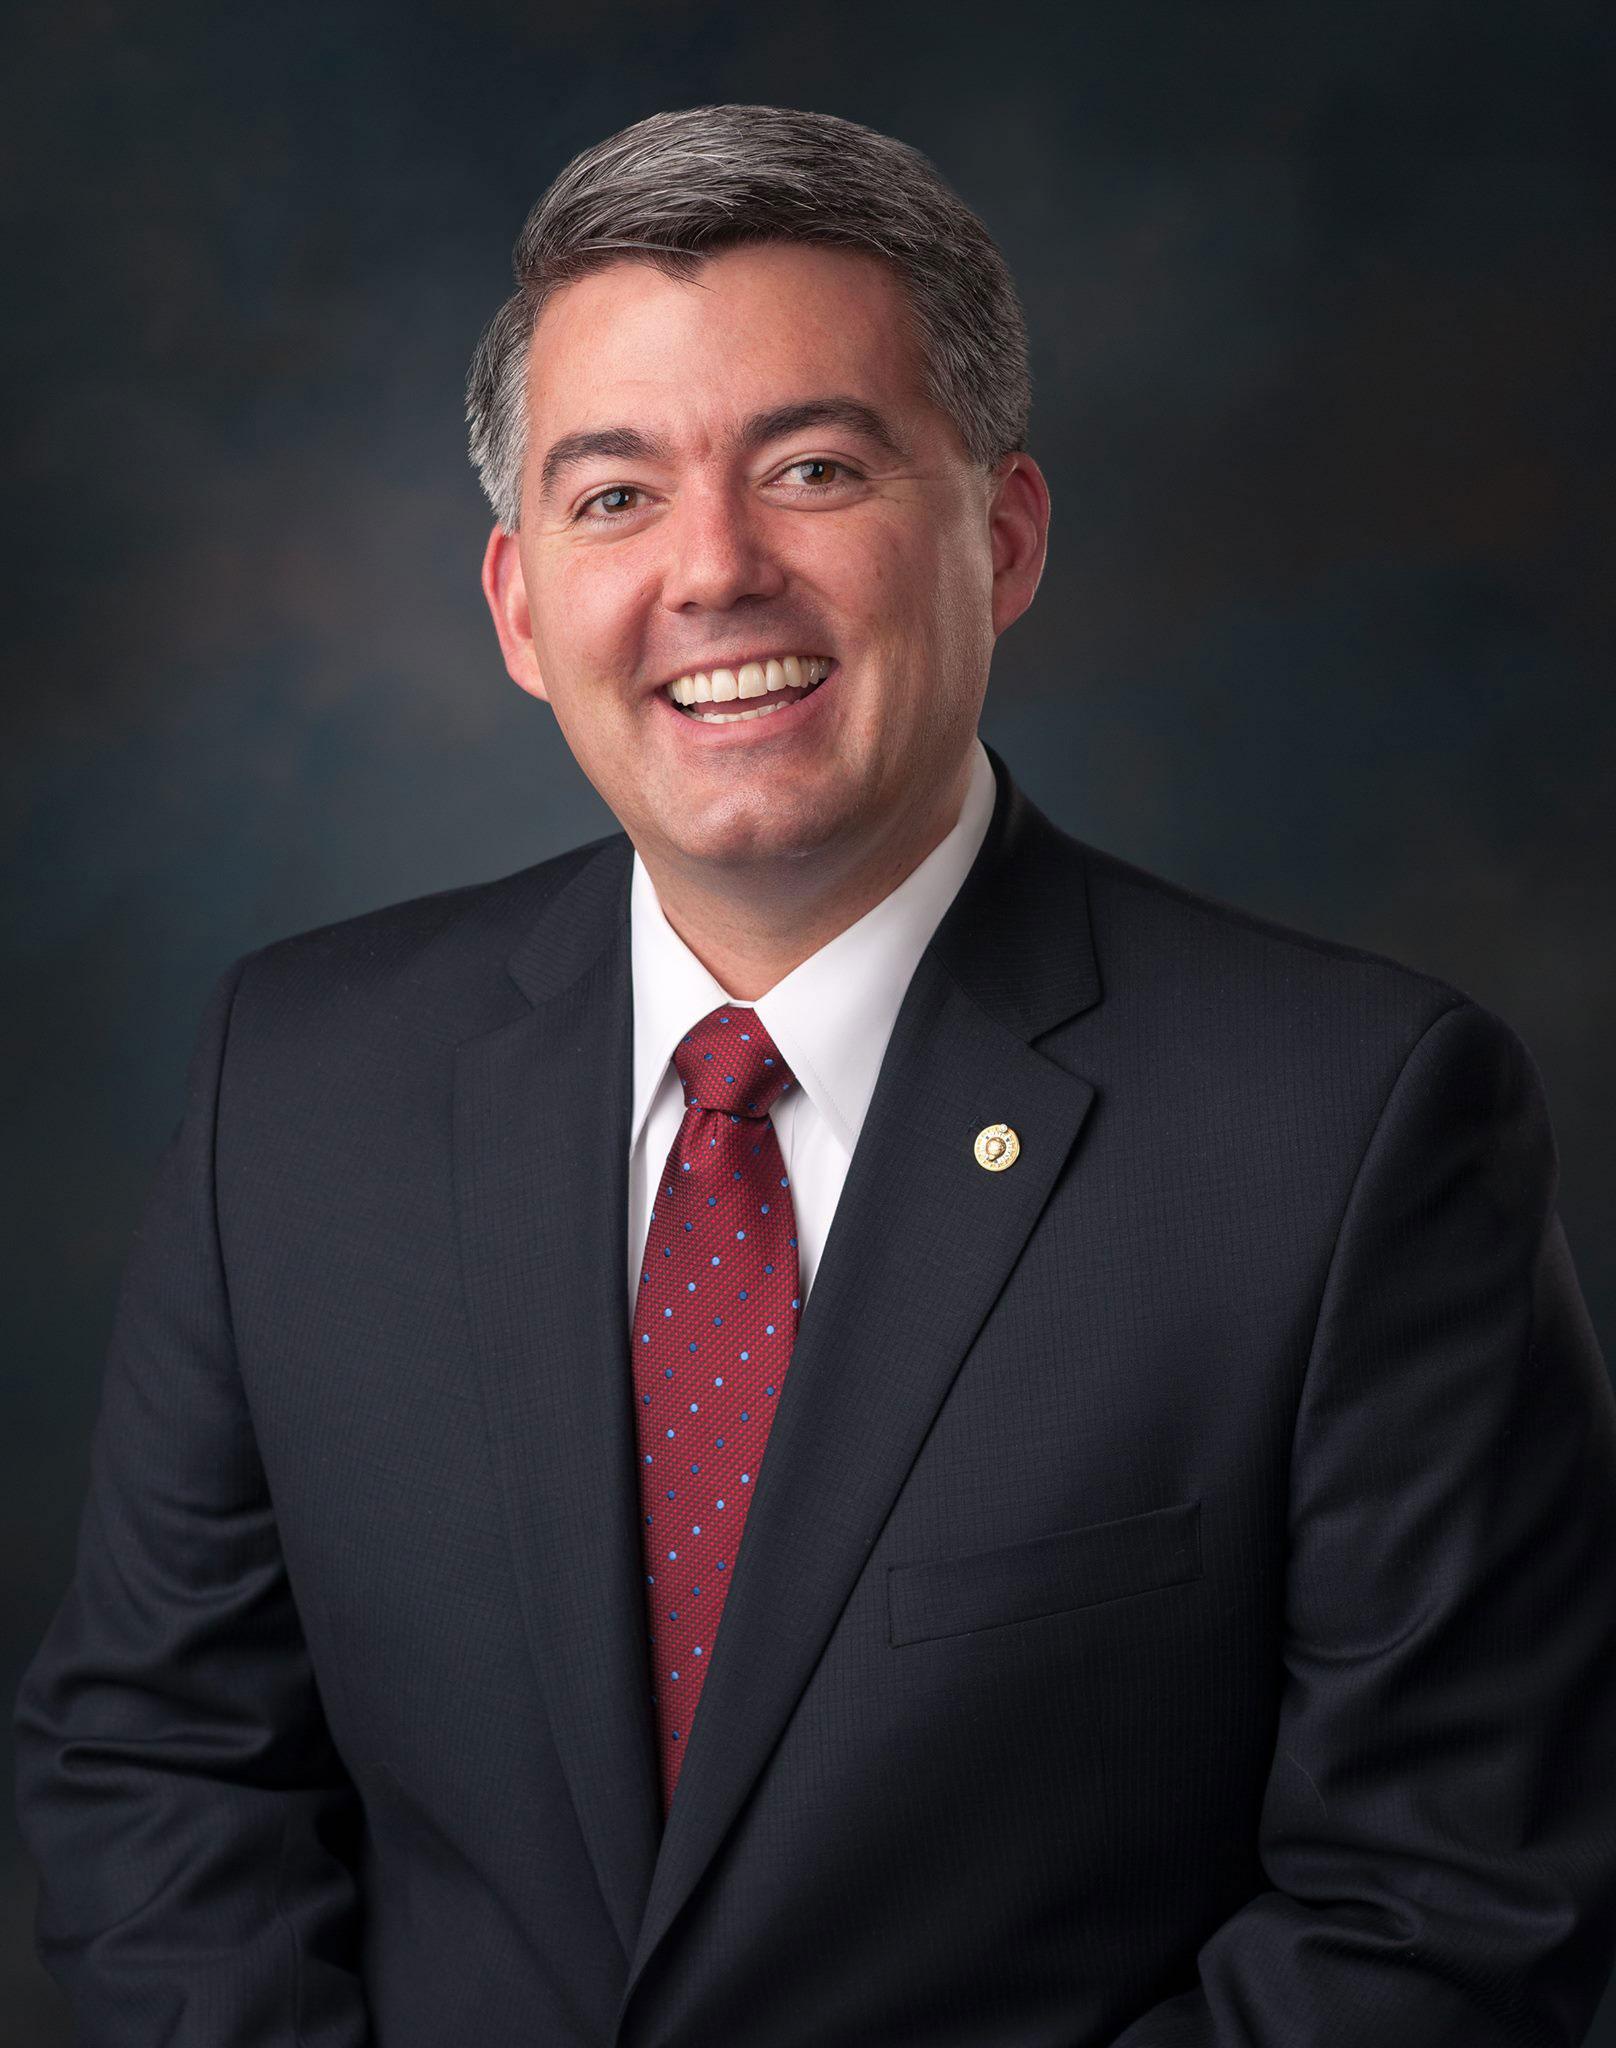 Cory Gardner official Senate portrait.jpeg